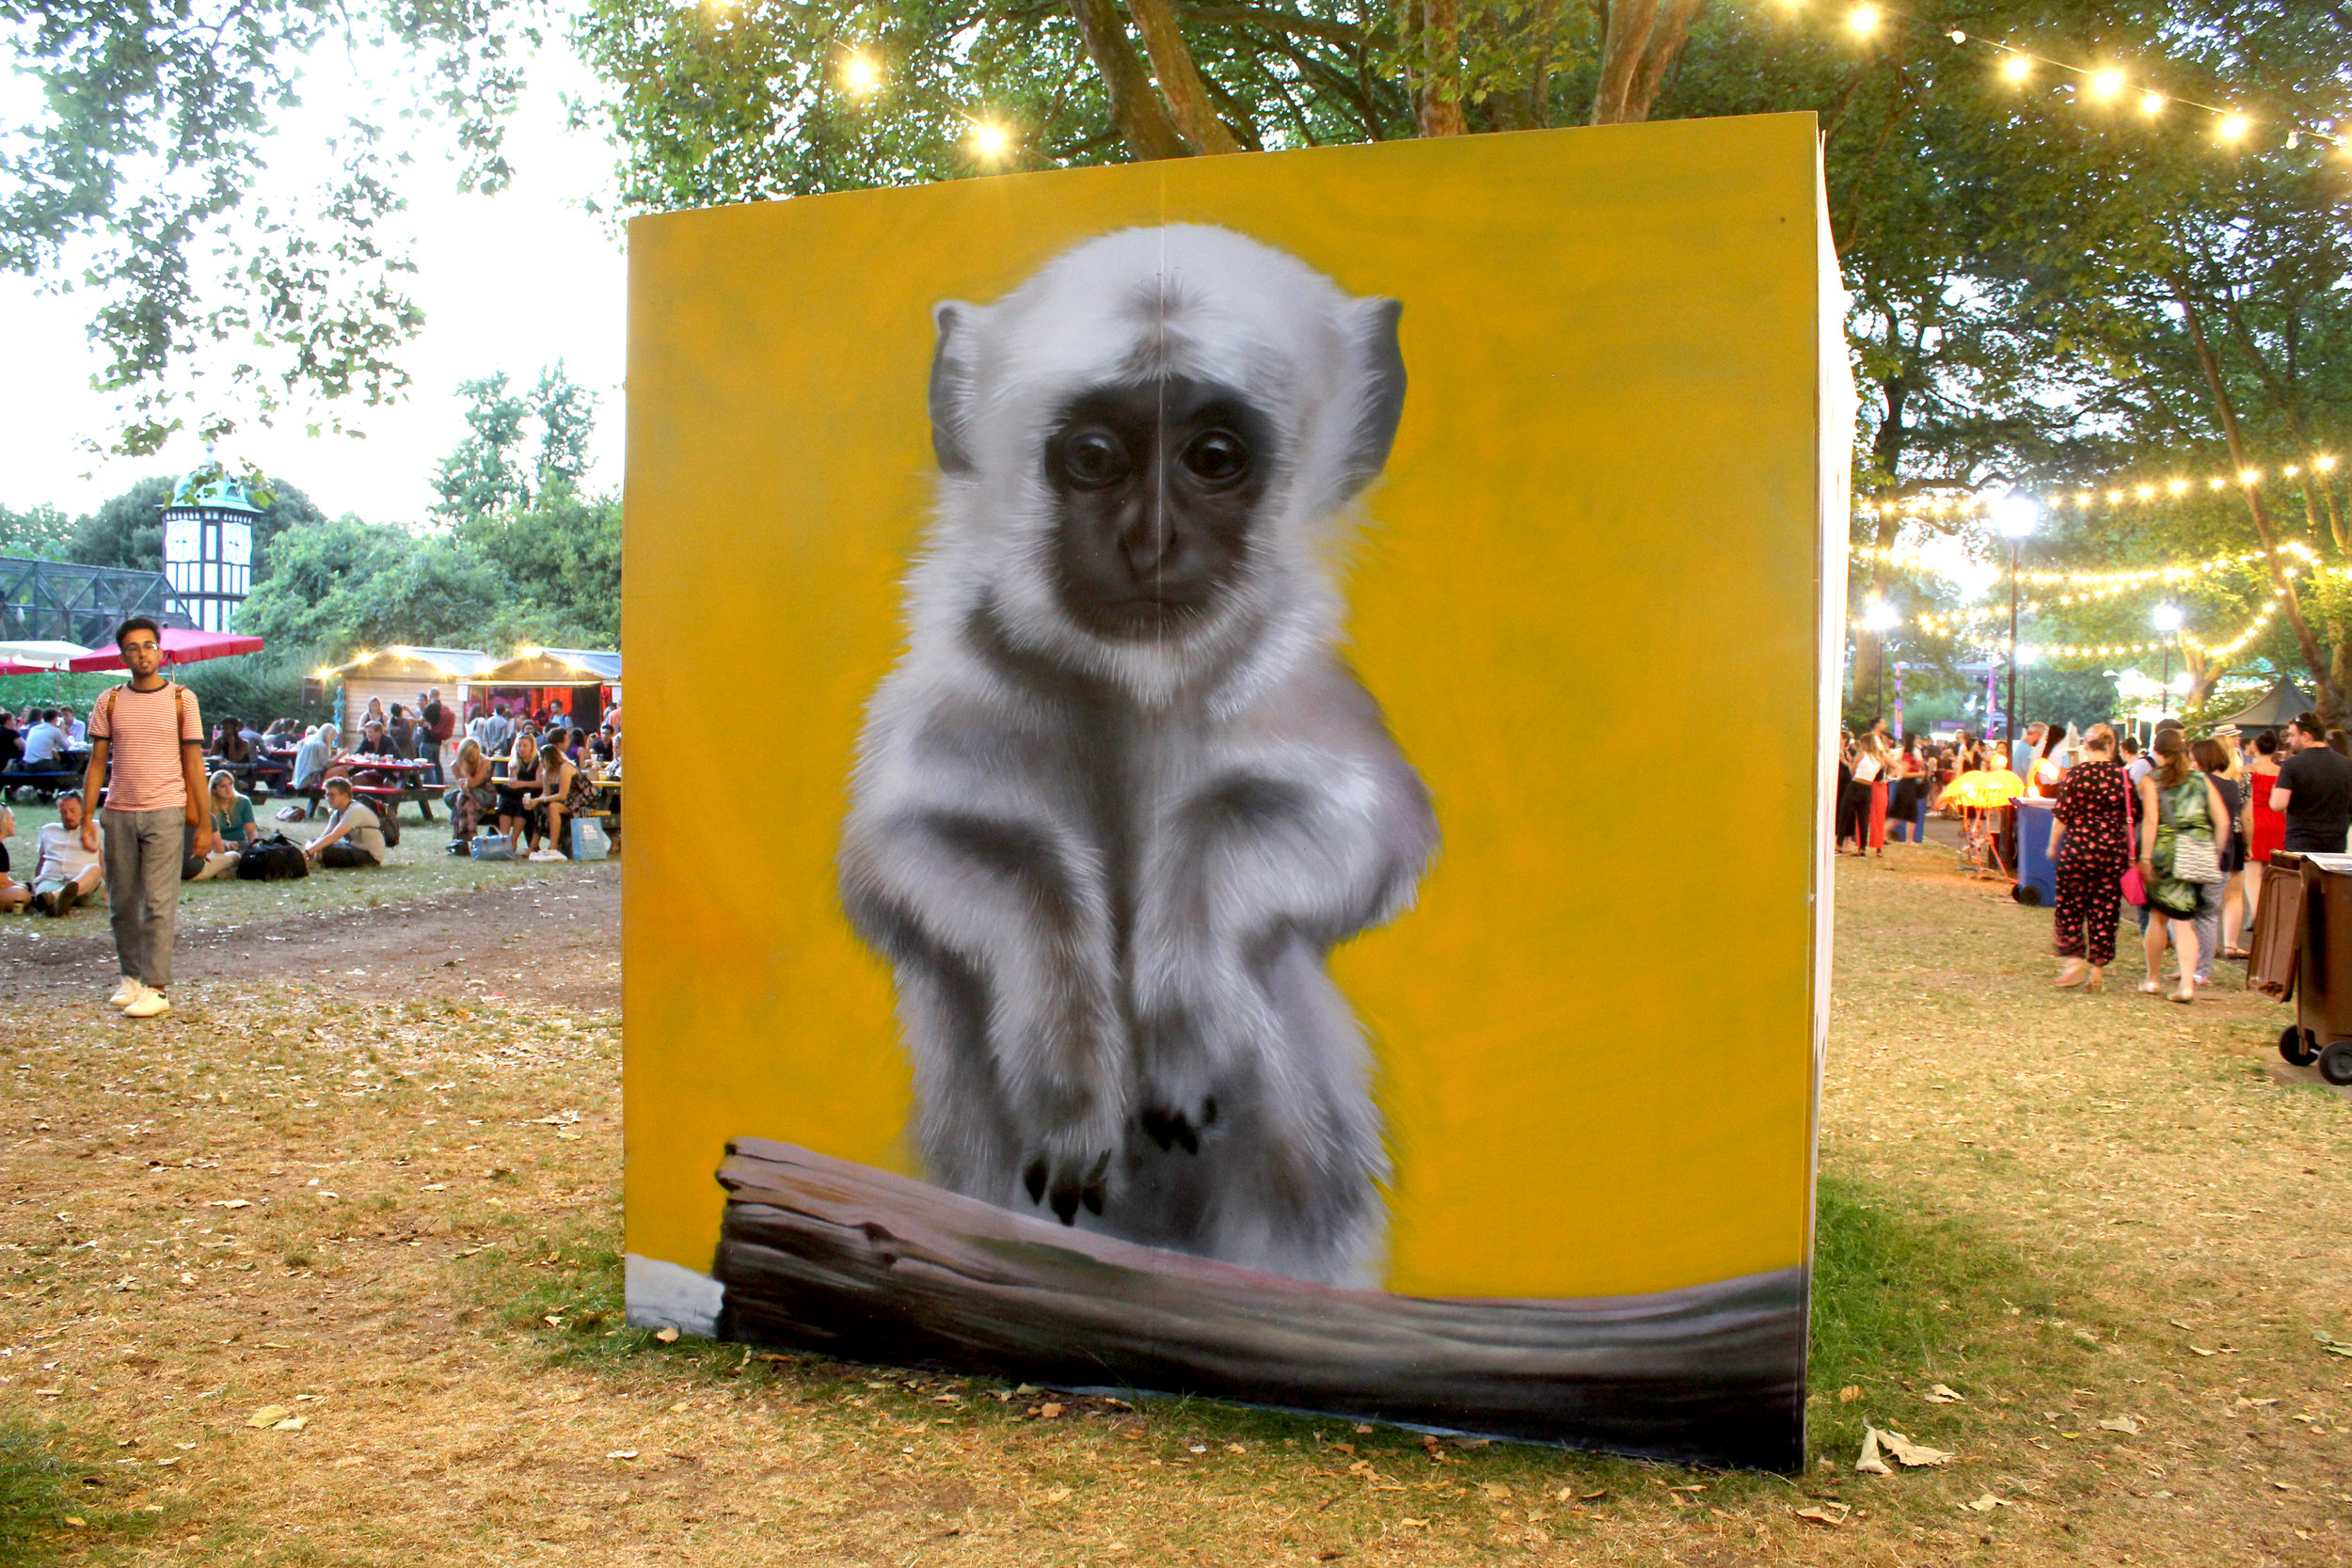 London Zoo Monkey.jpg